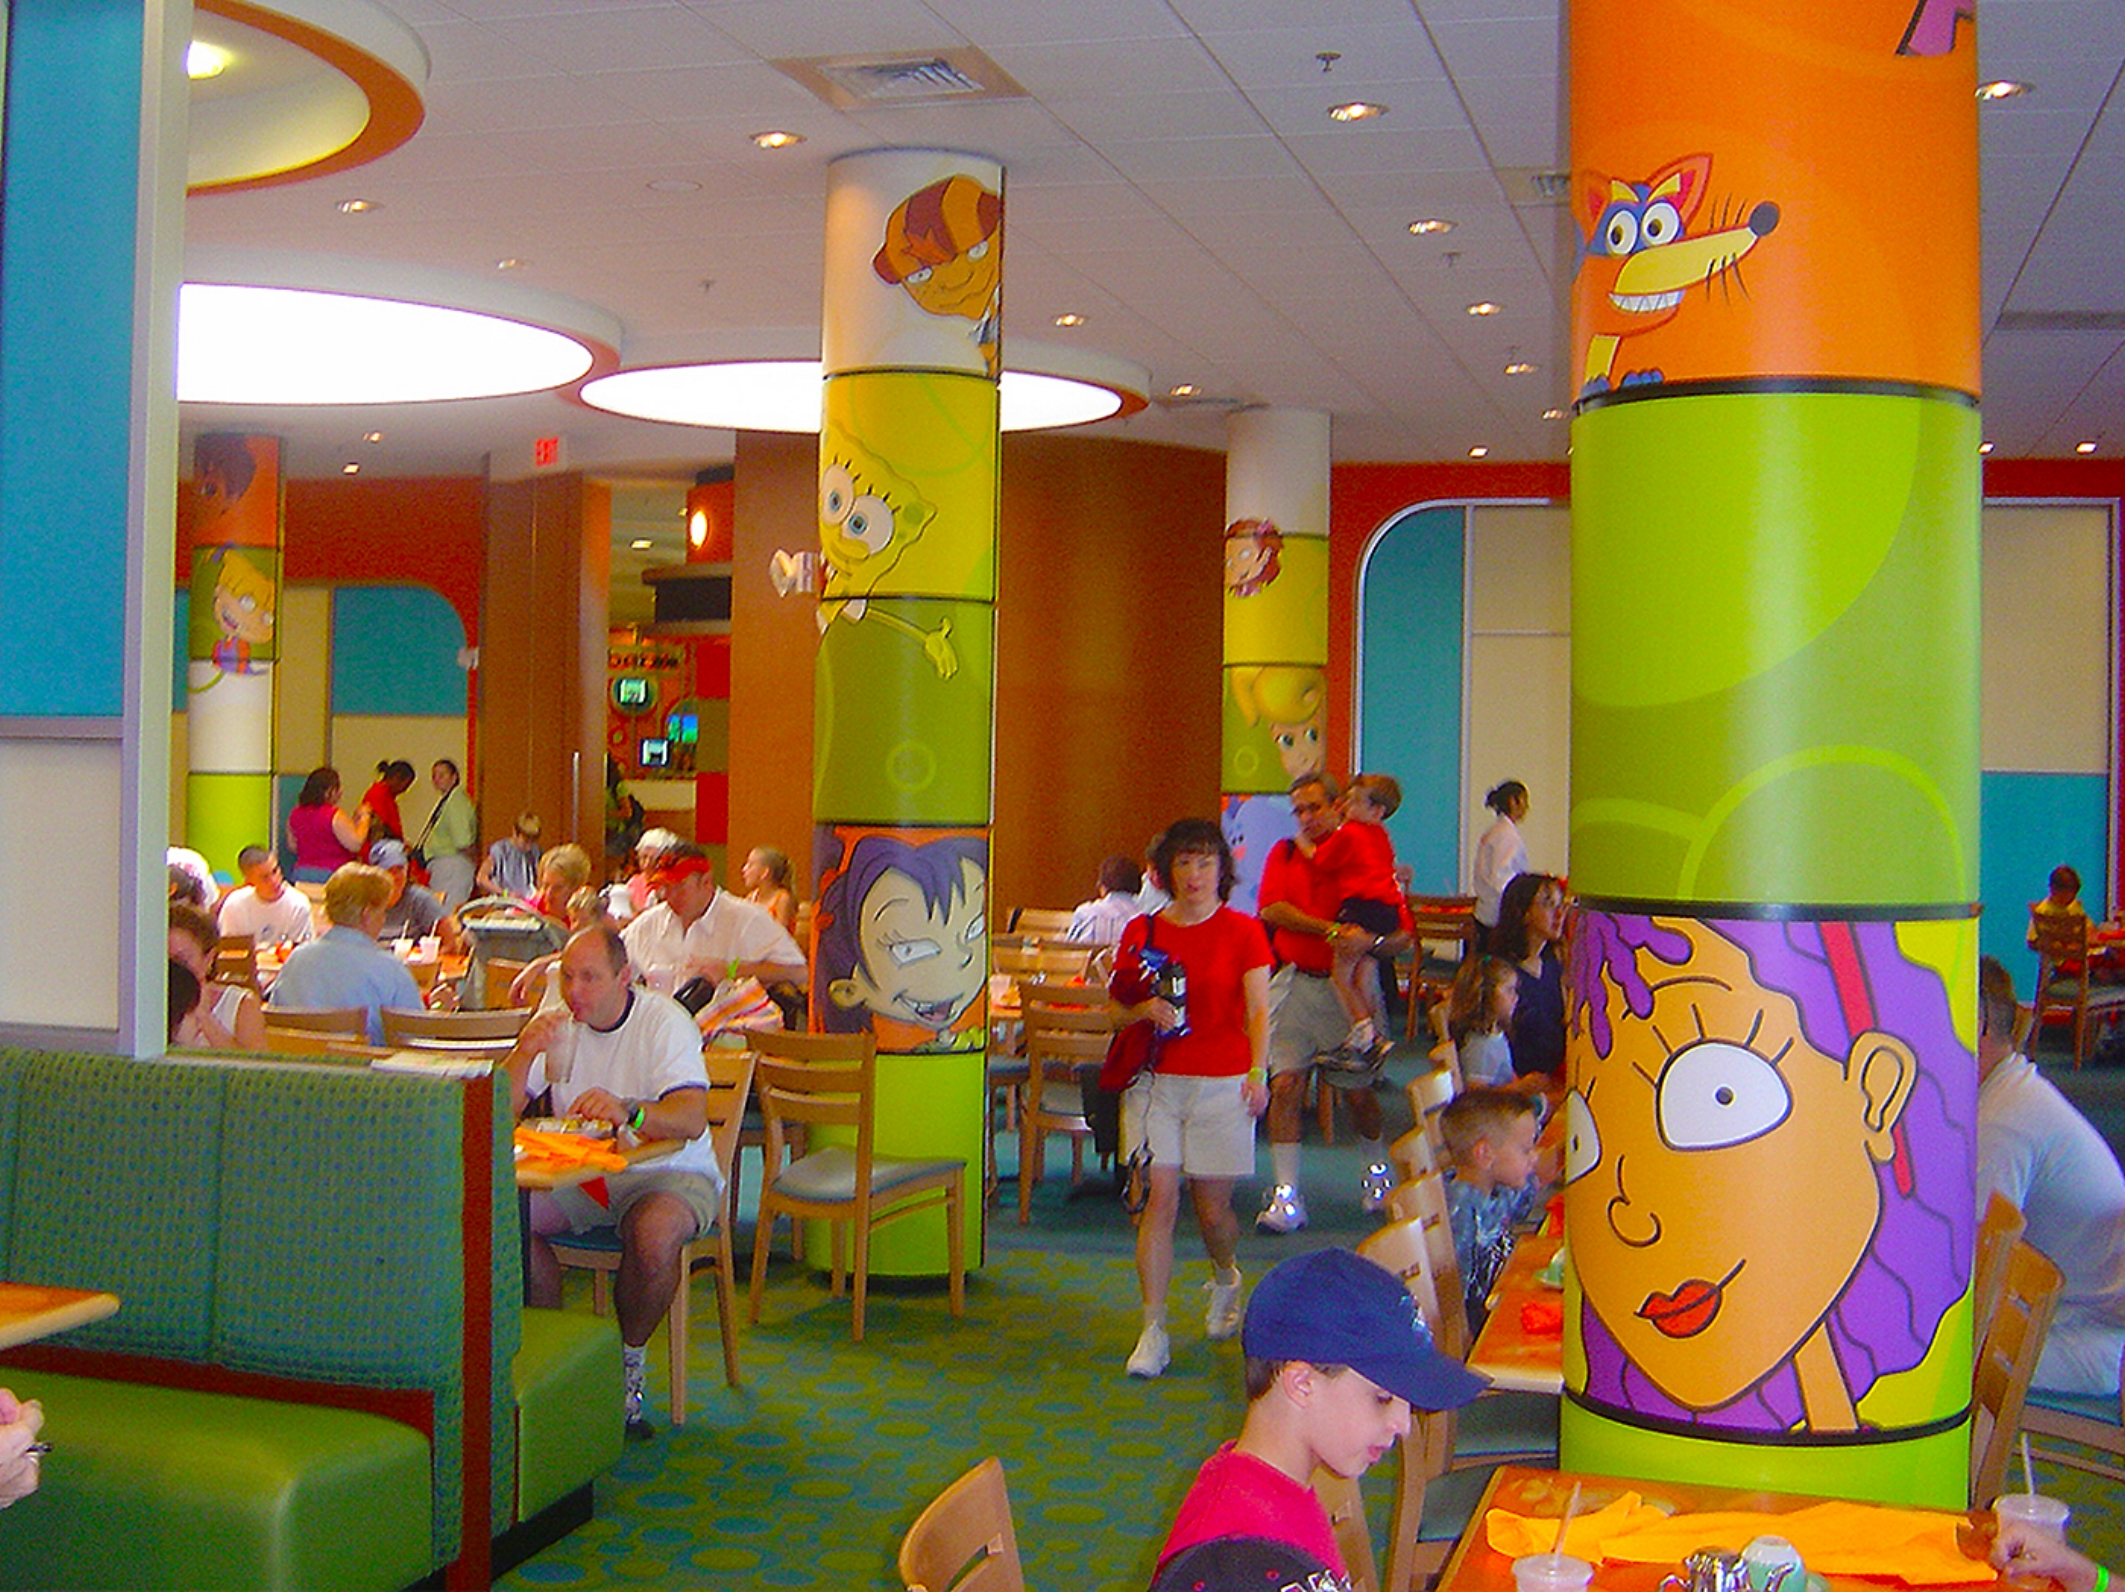 Nickelodeon Food Court